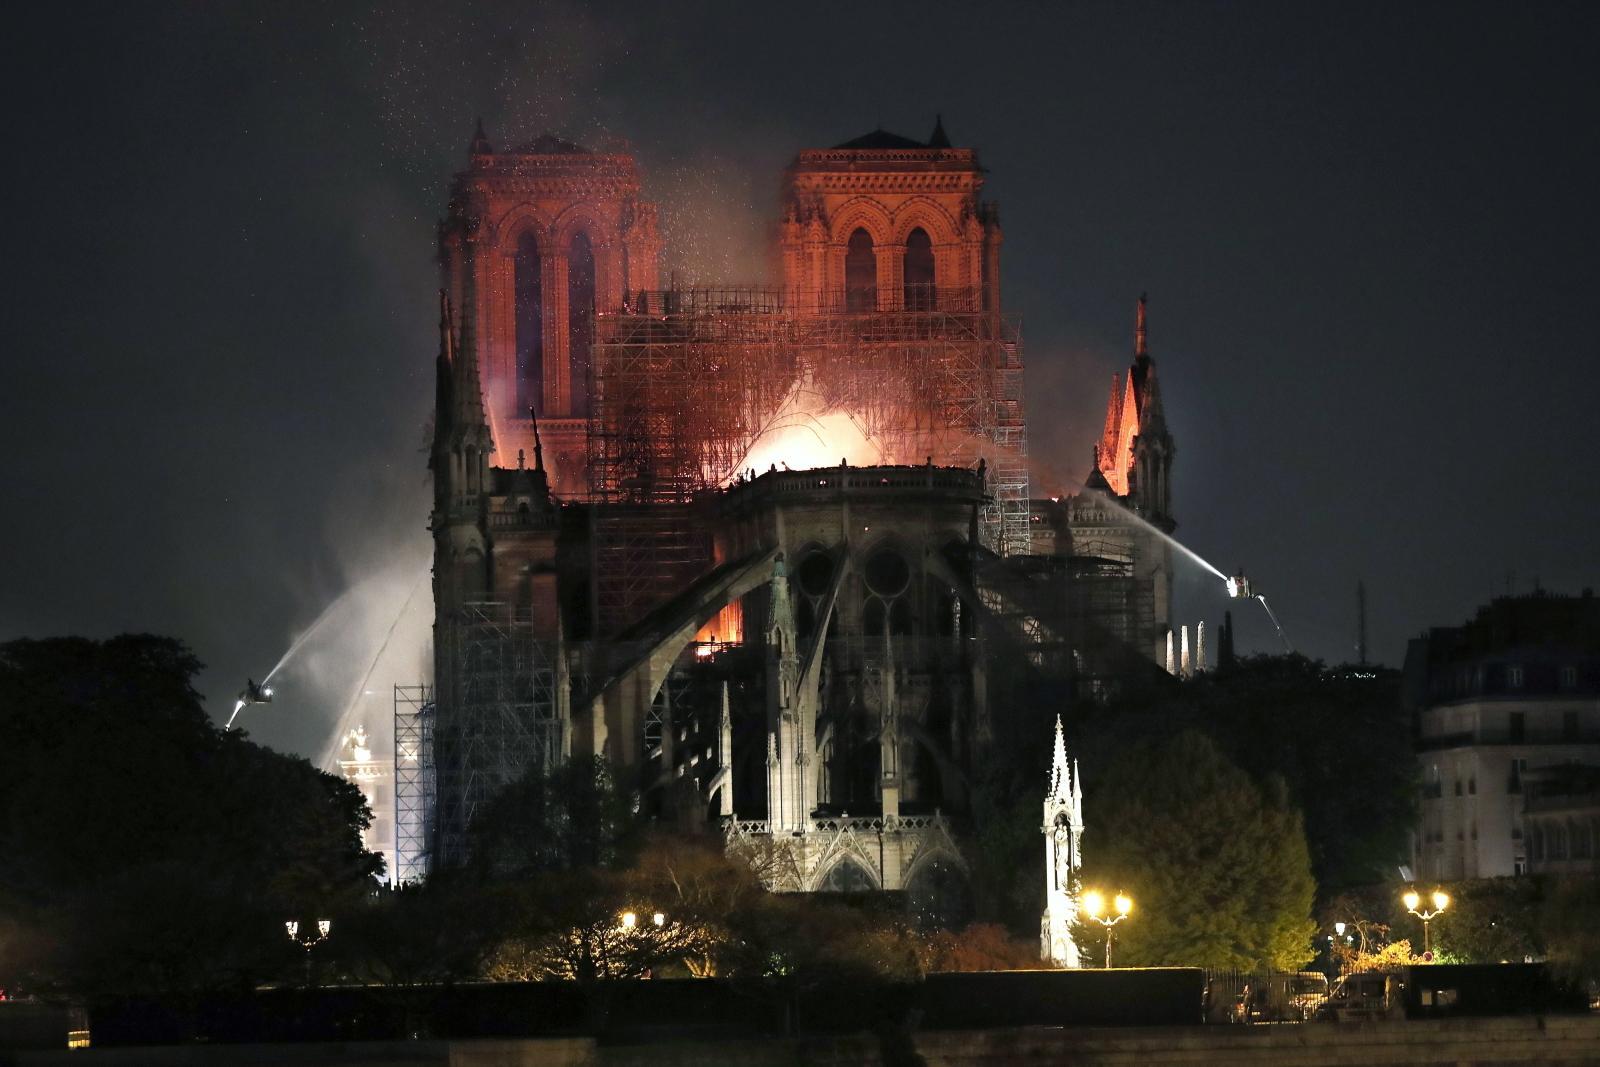 Płonęła historyczna katedra Notre Dame